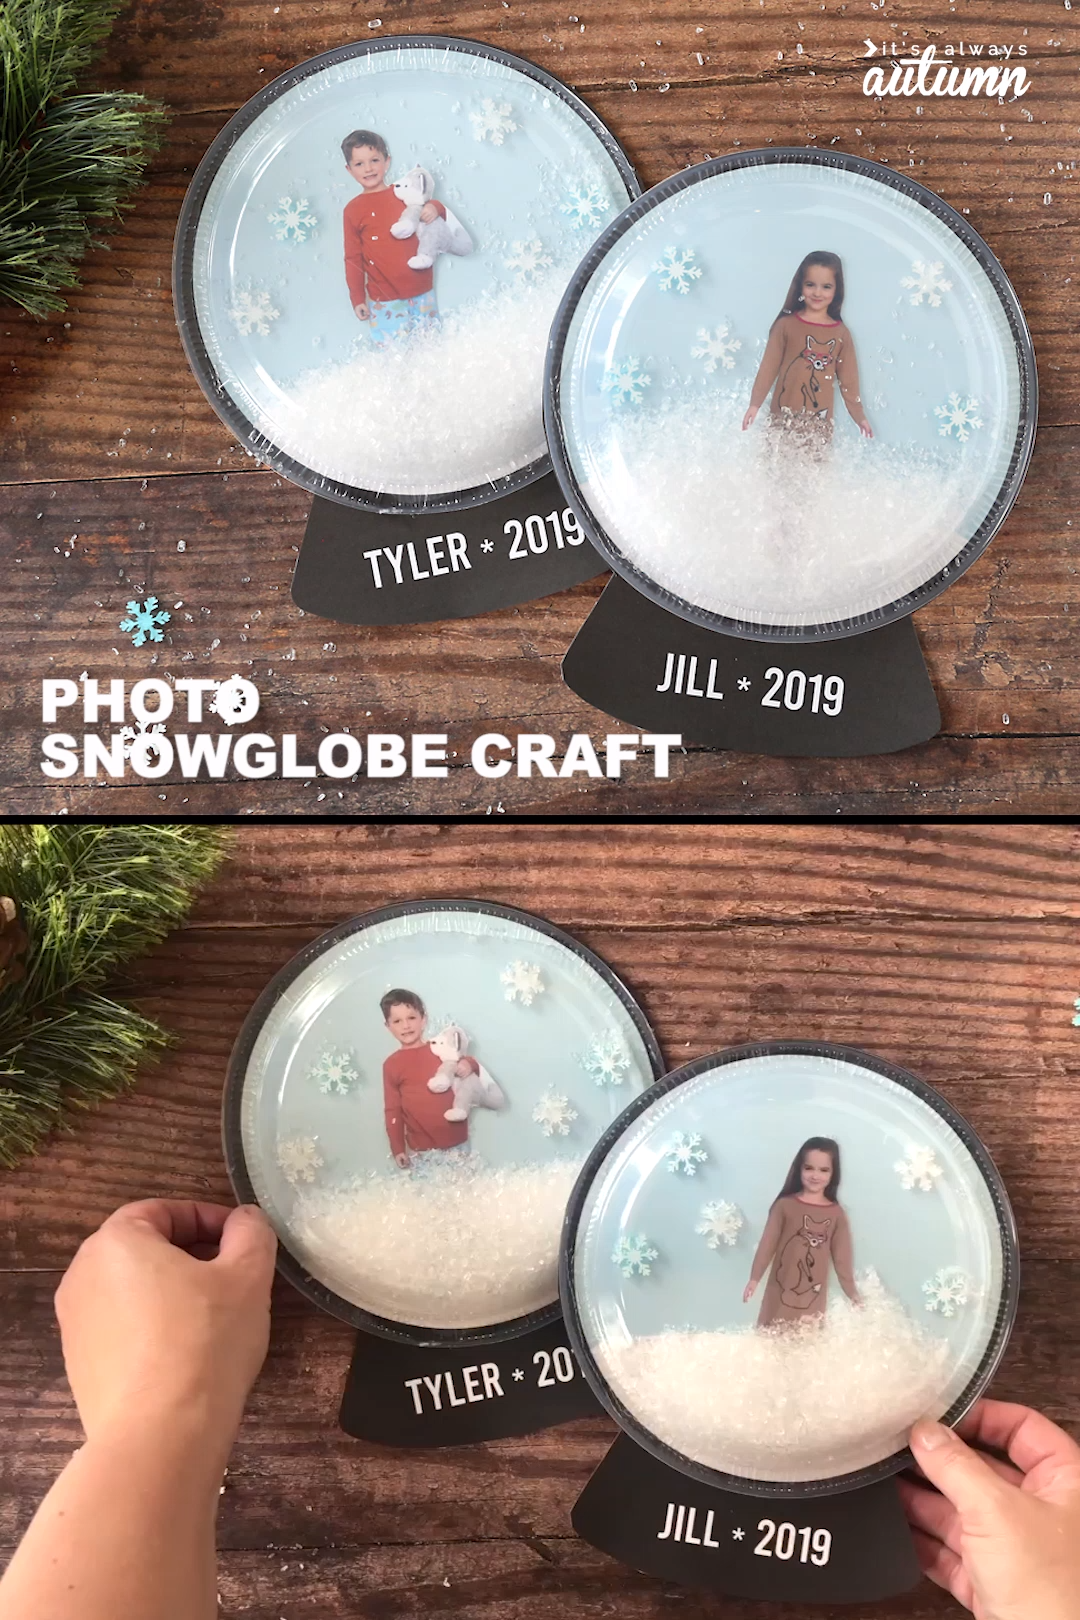 Photo Snowglobe Craft